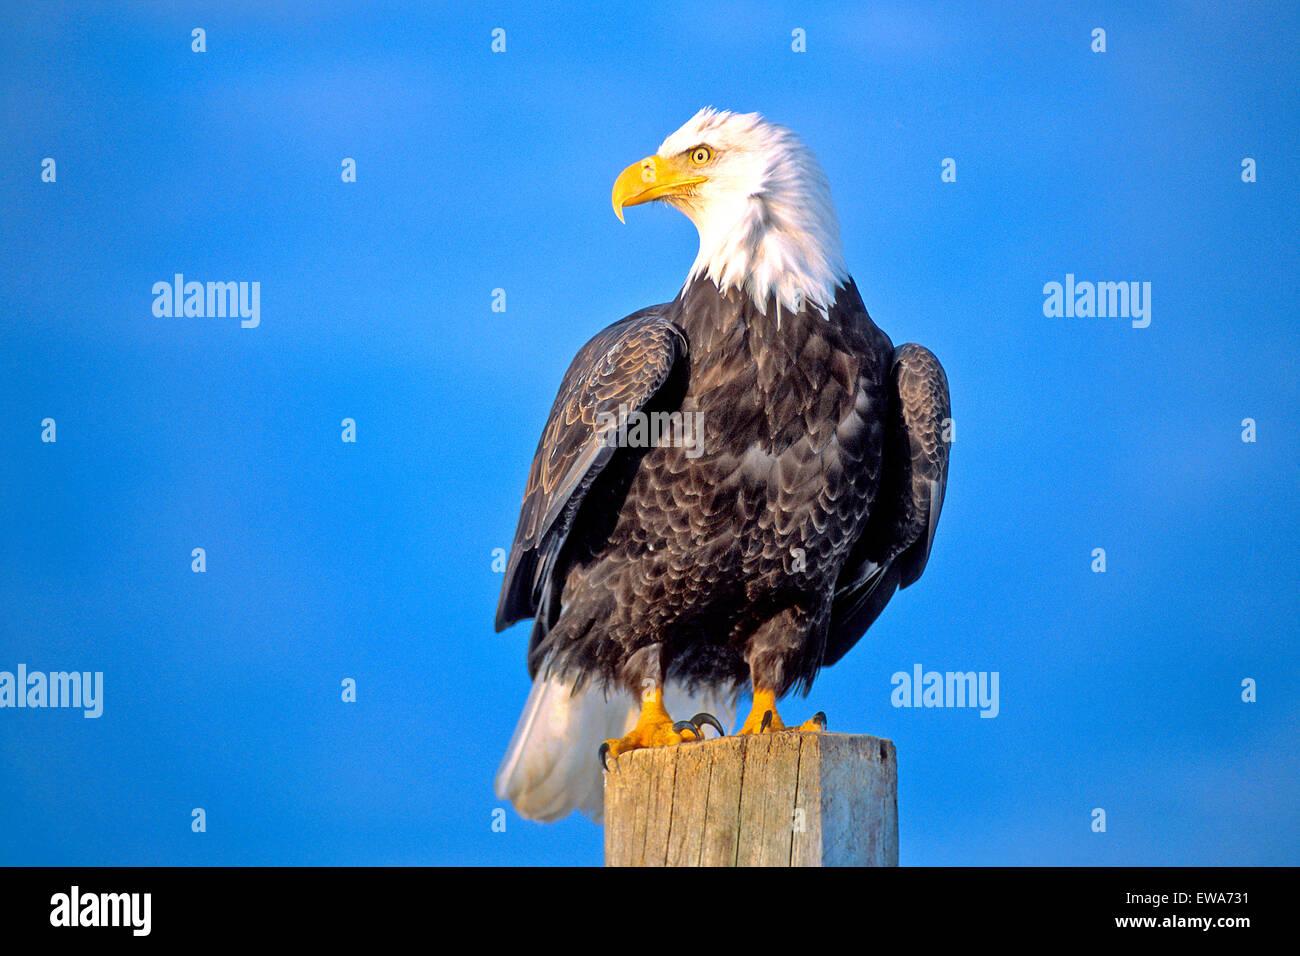 Bald Eagle sitting on post near water, Alaska - Stock Image